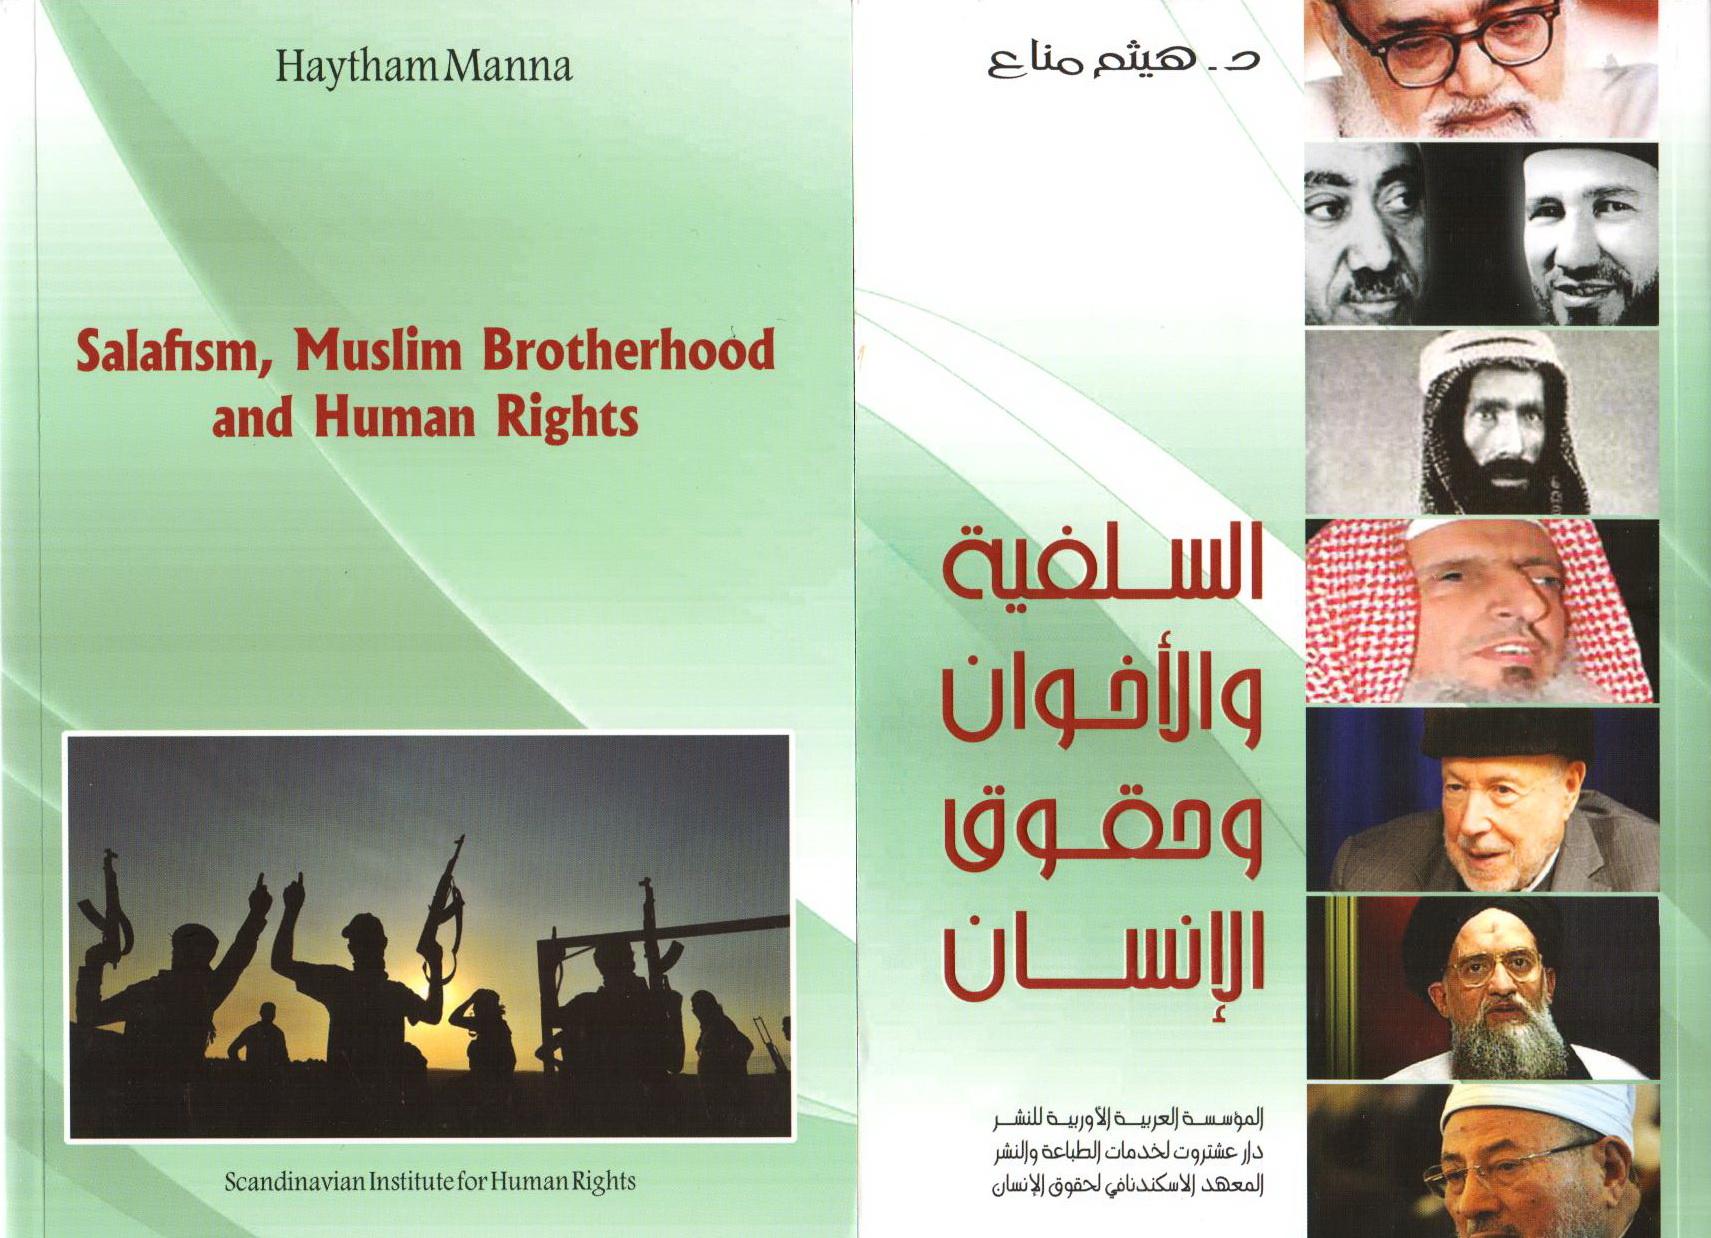 Salafism, Muslim Brotherhood and Human Rights